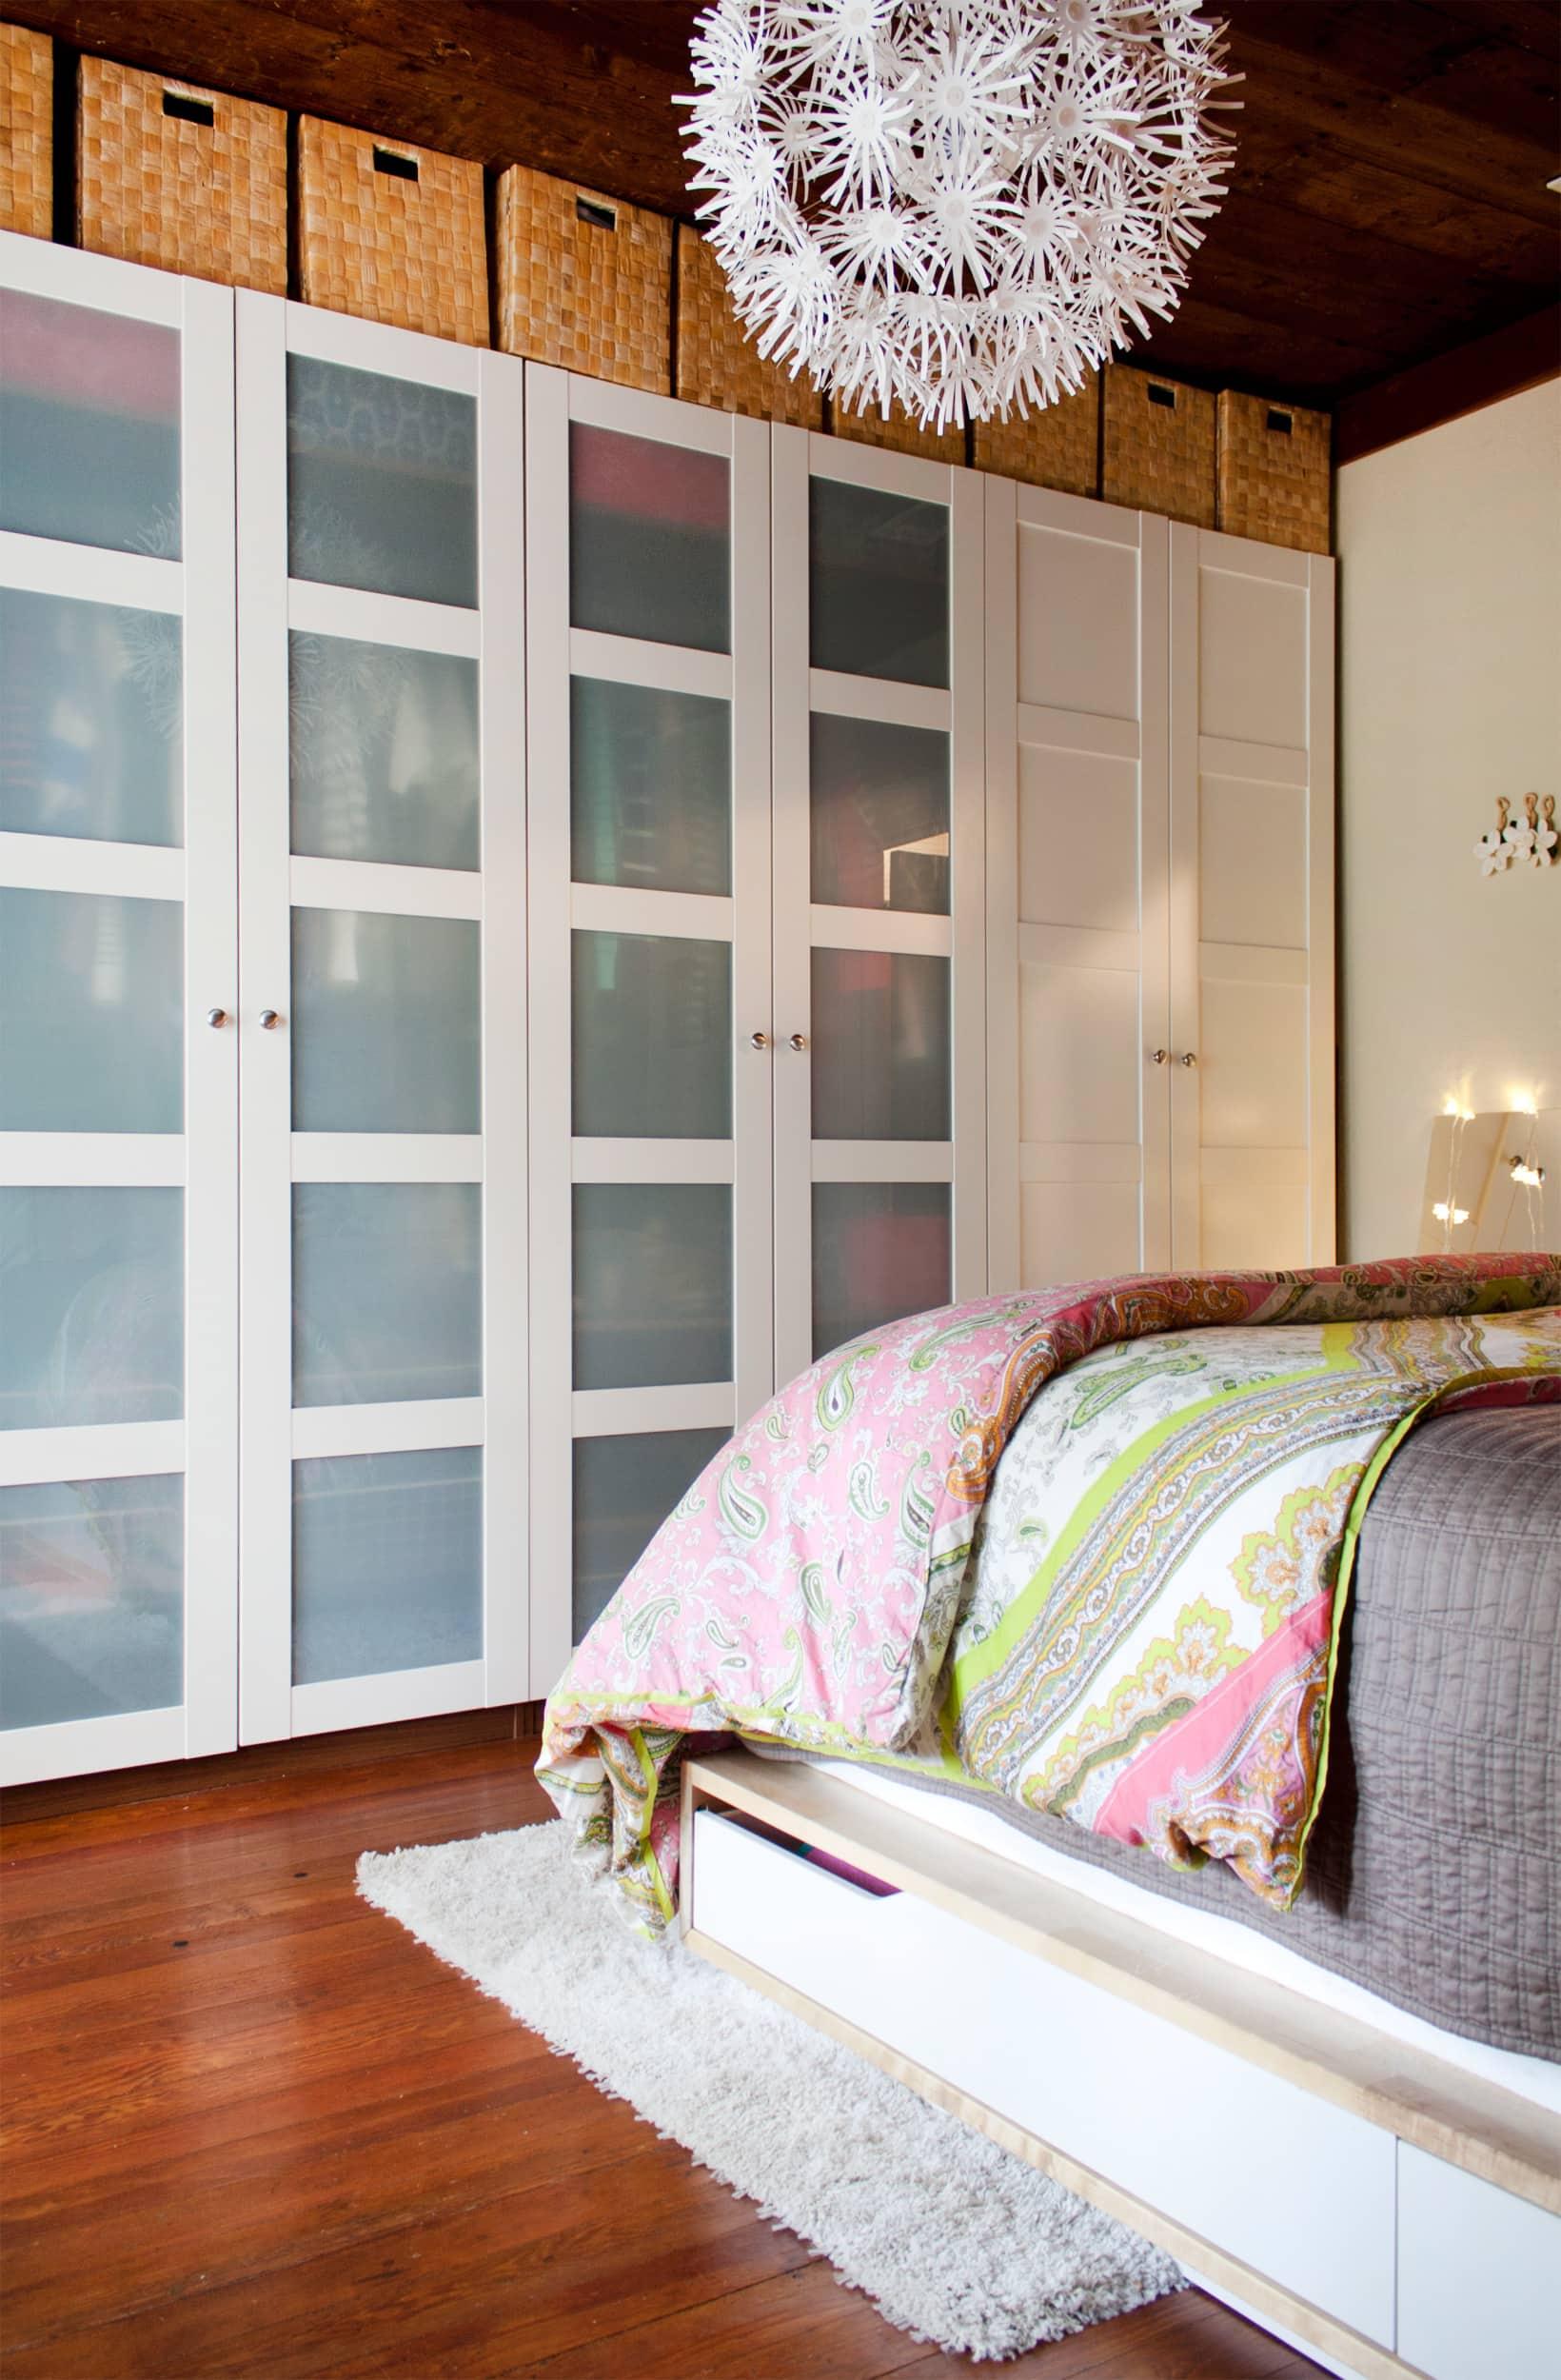 bedroom IKEA wardrobe storage with baskets